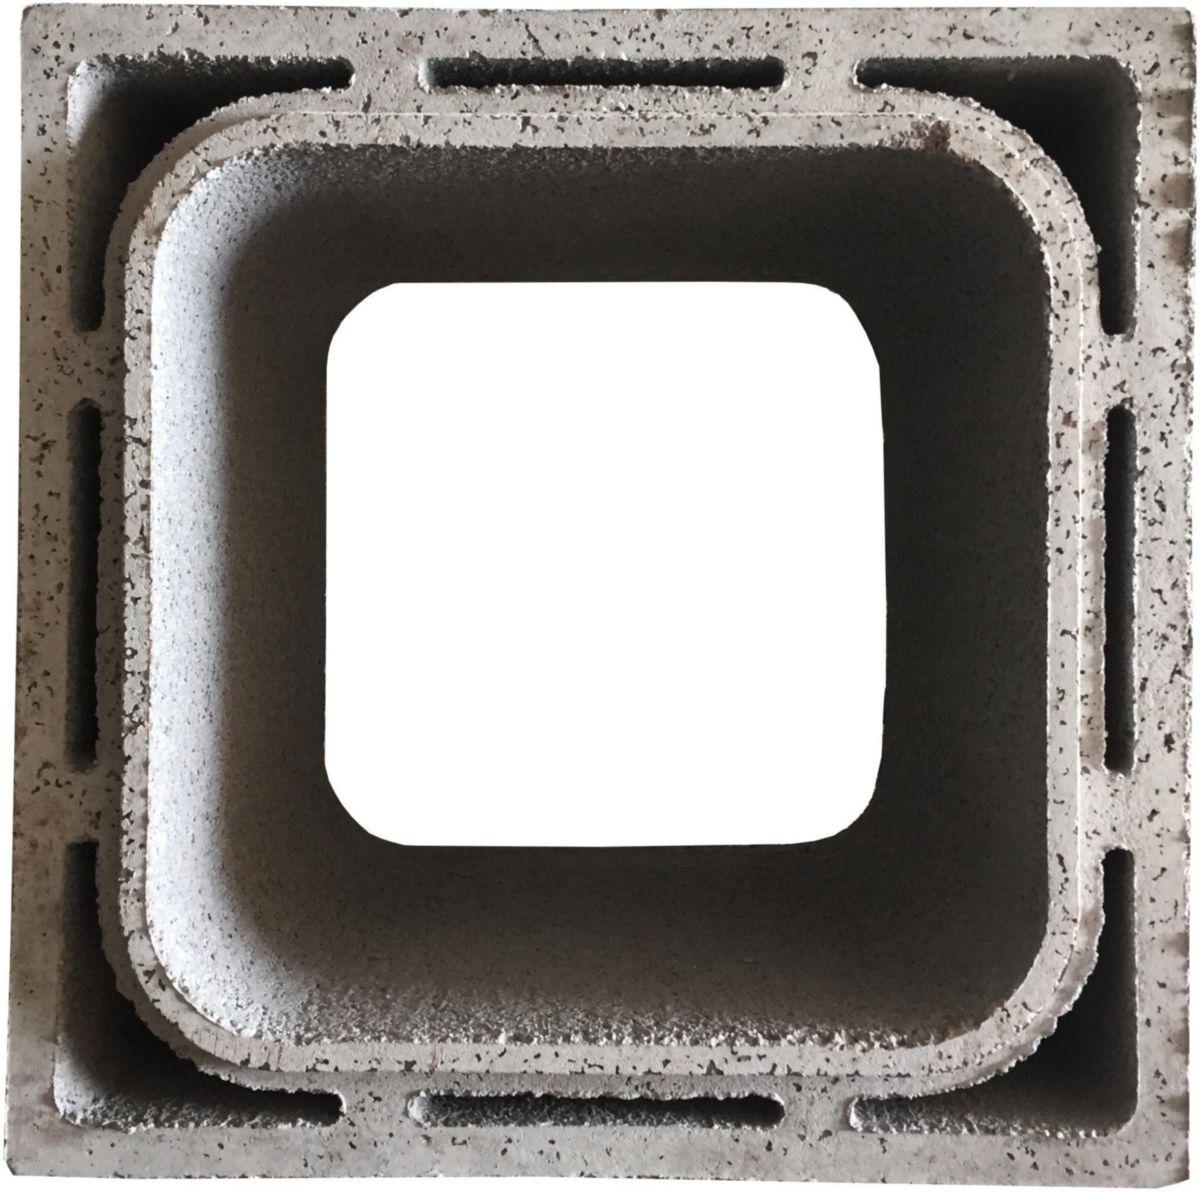 Boisseau Cbr5 30x30x33 Cm Beton Pouzzolane Allege Novatab